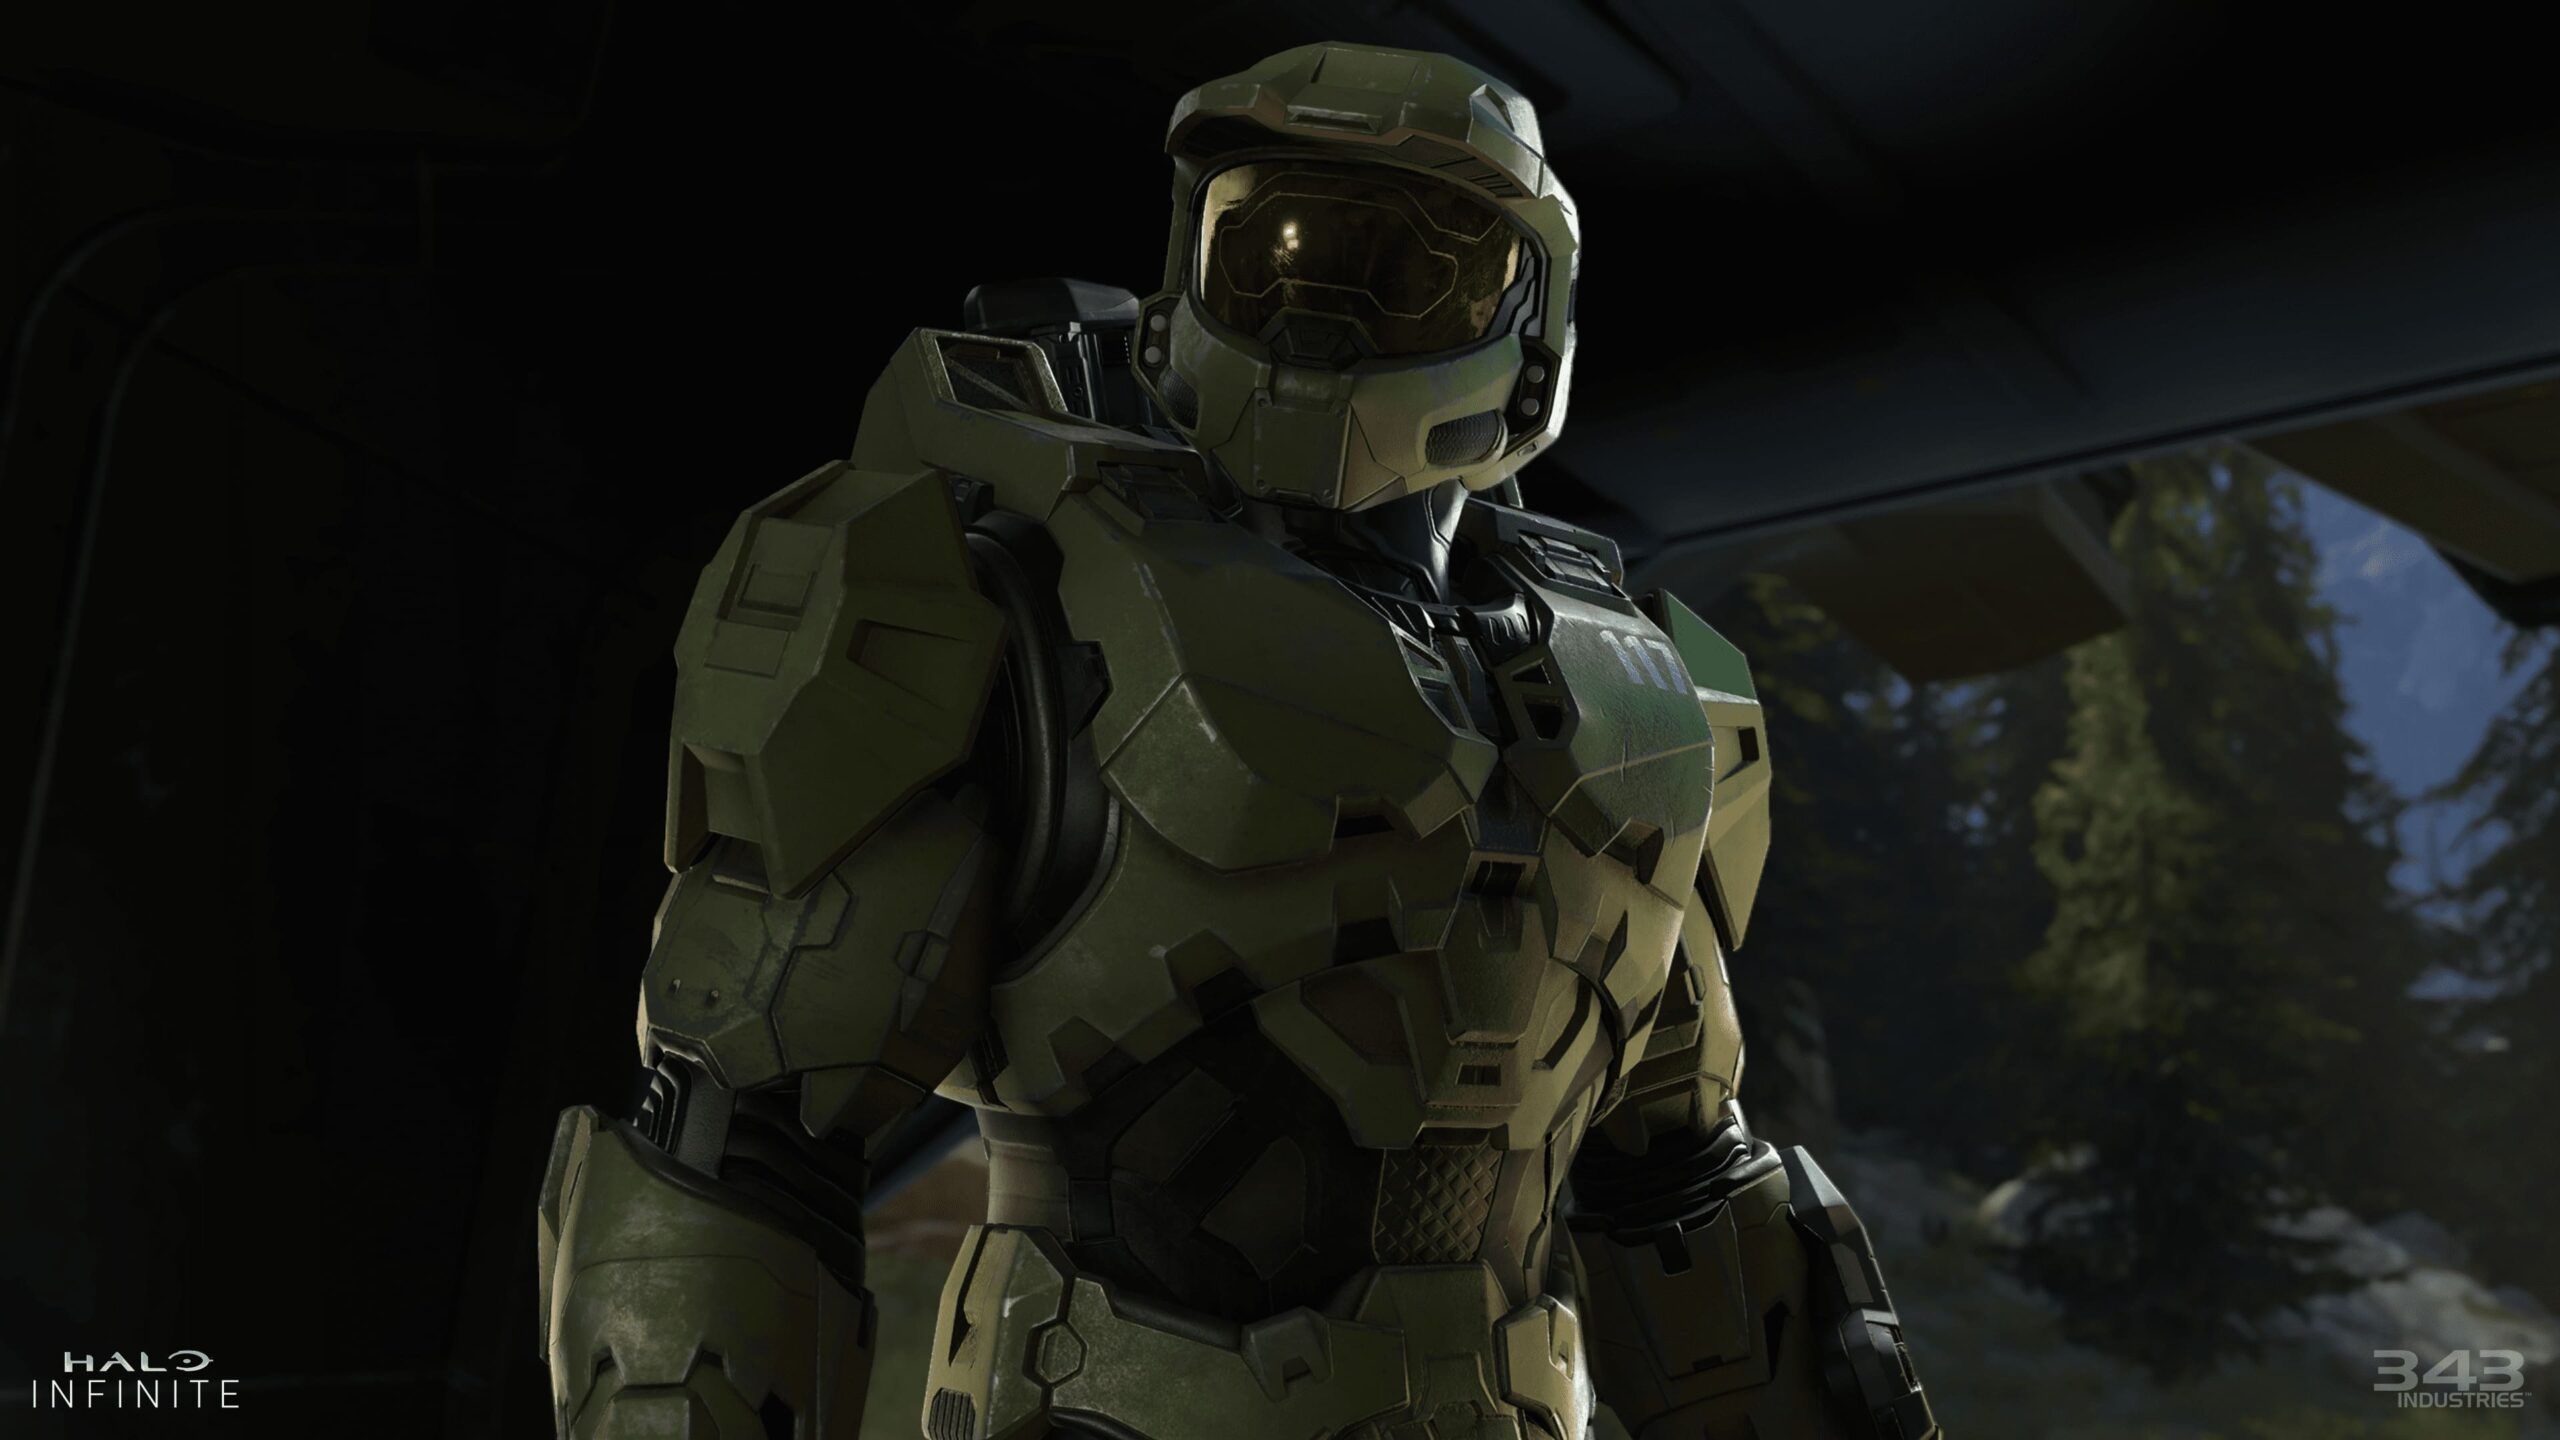 Xbox Halo Infinite Xbox Series X